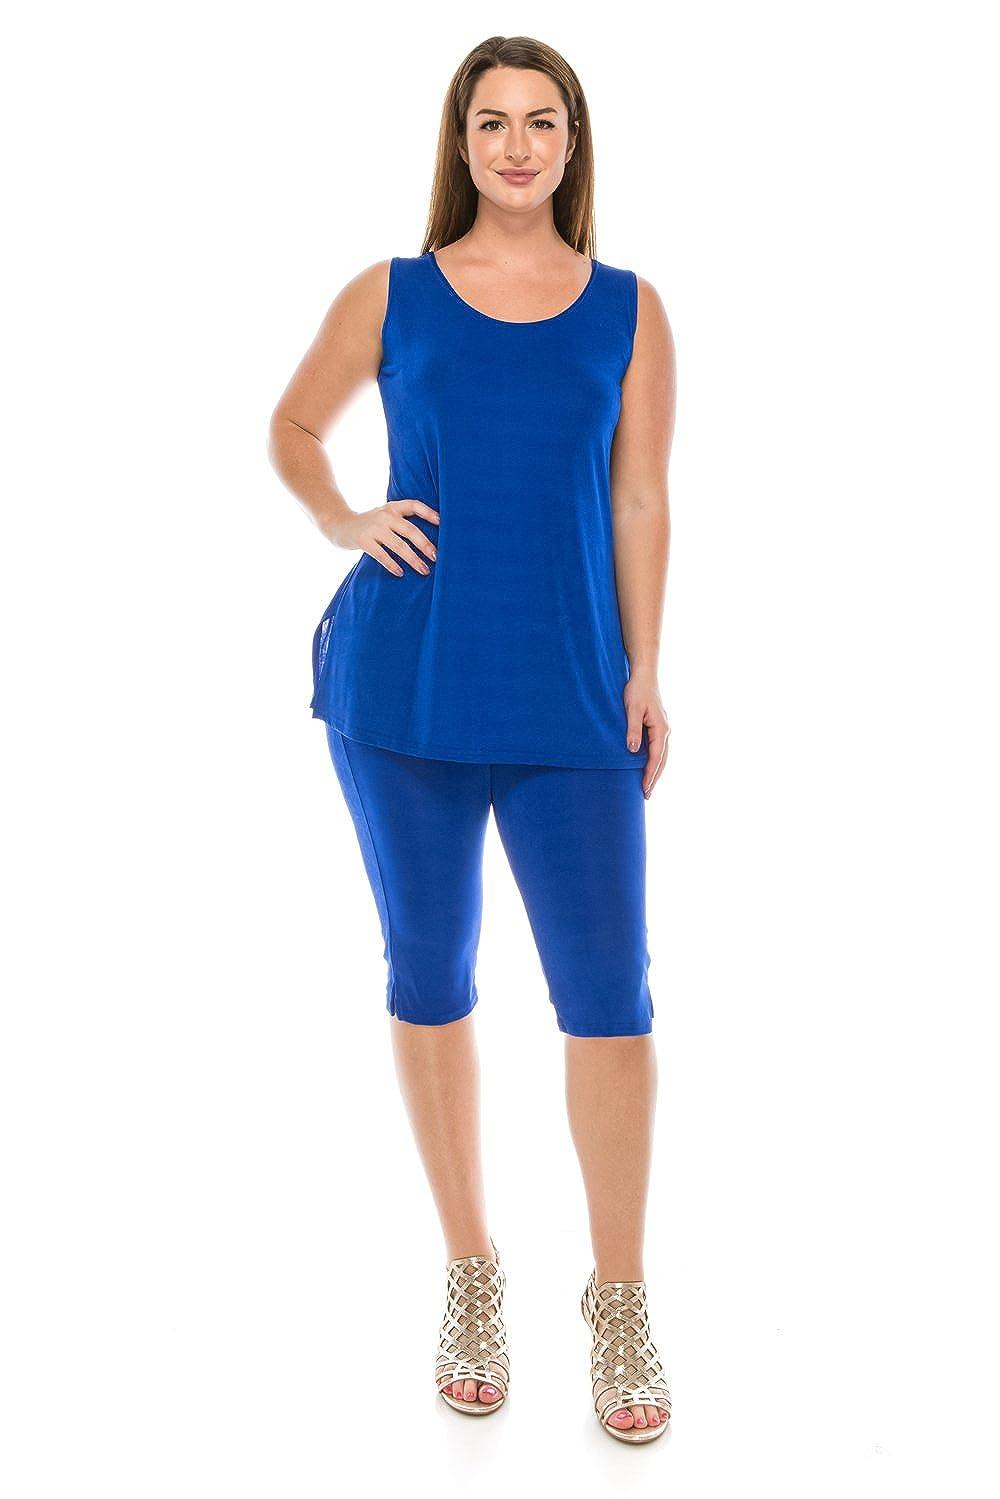 6d9c481cf52 Jostar Women s Stretchy Tank Capri Pant Set Sleeveless Plus Size - Made in  USA at Amazon Women s Clothing store